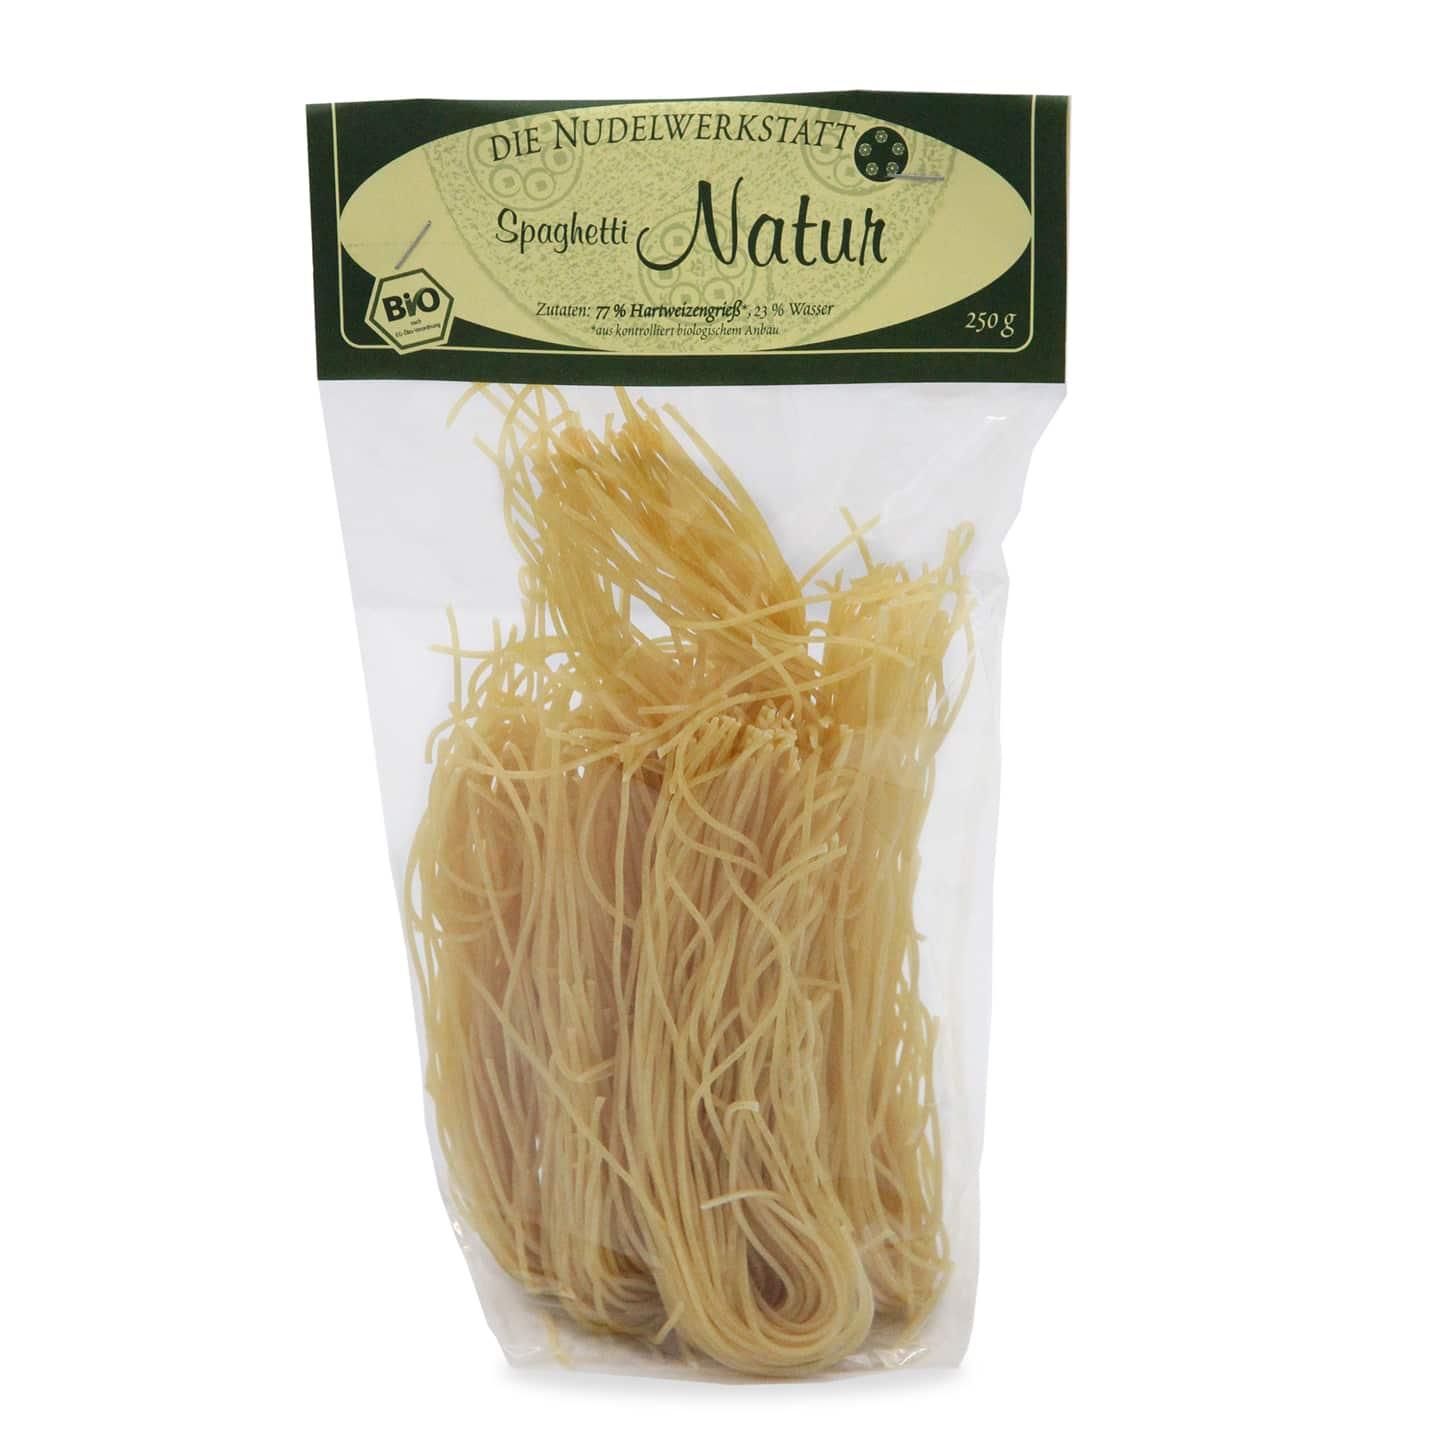 SpaghettiNatur 250g